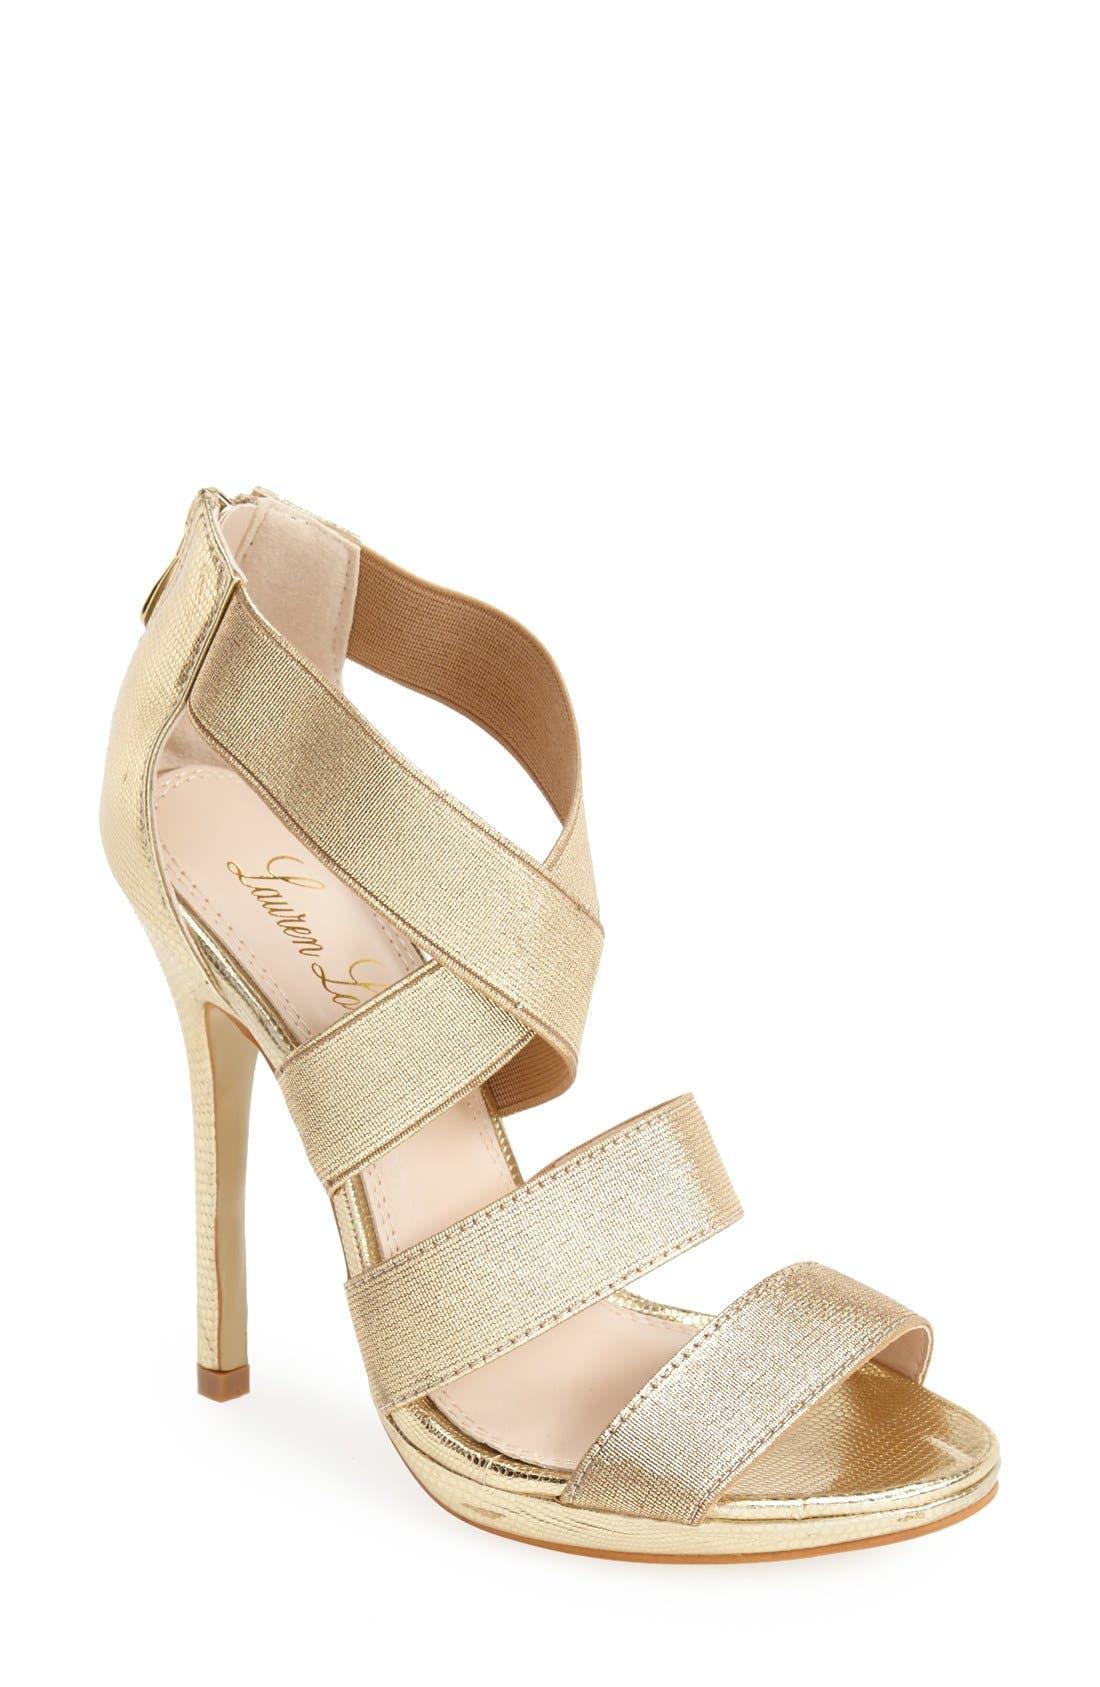 Main Image - Lauren Lorraine 'Lipsy' Platform Sandal (Women)